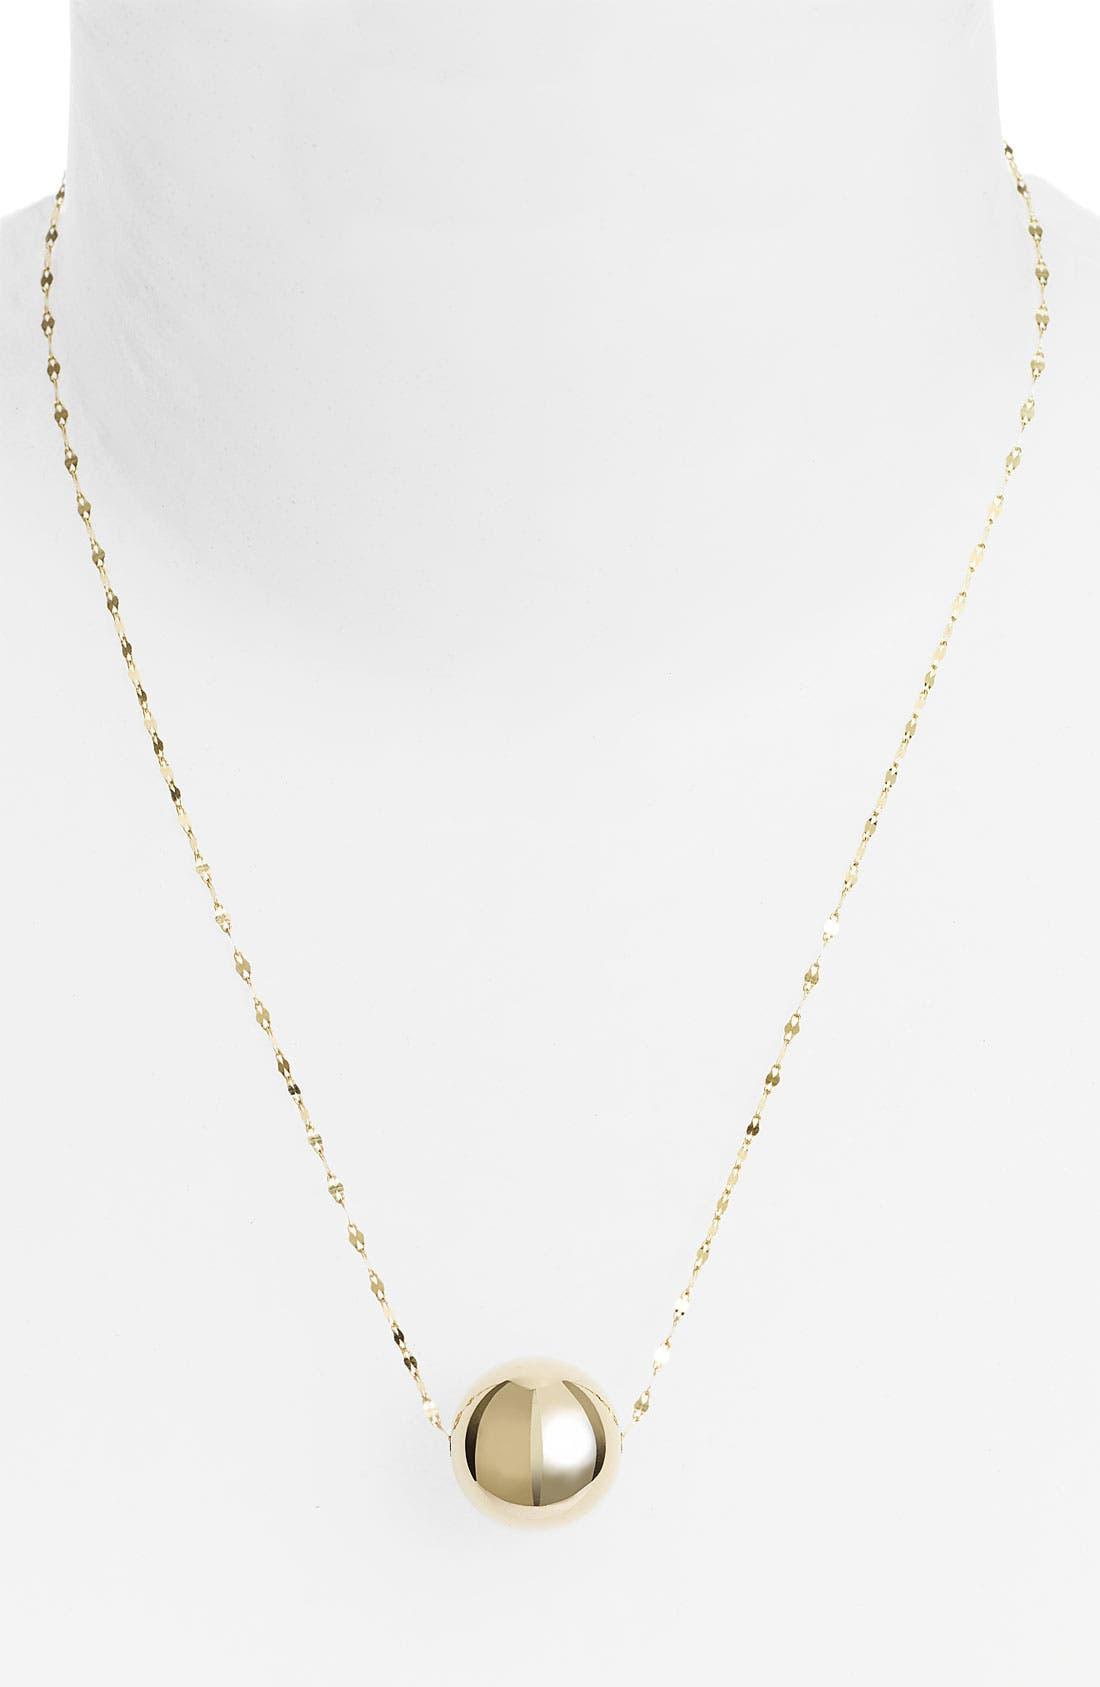 Main Image - Lana Jewelry 'St. Tropez' Necklace